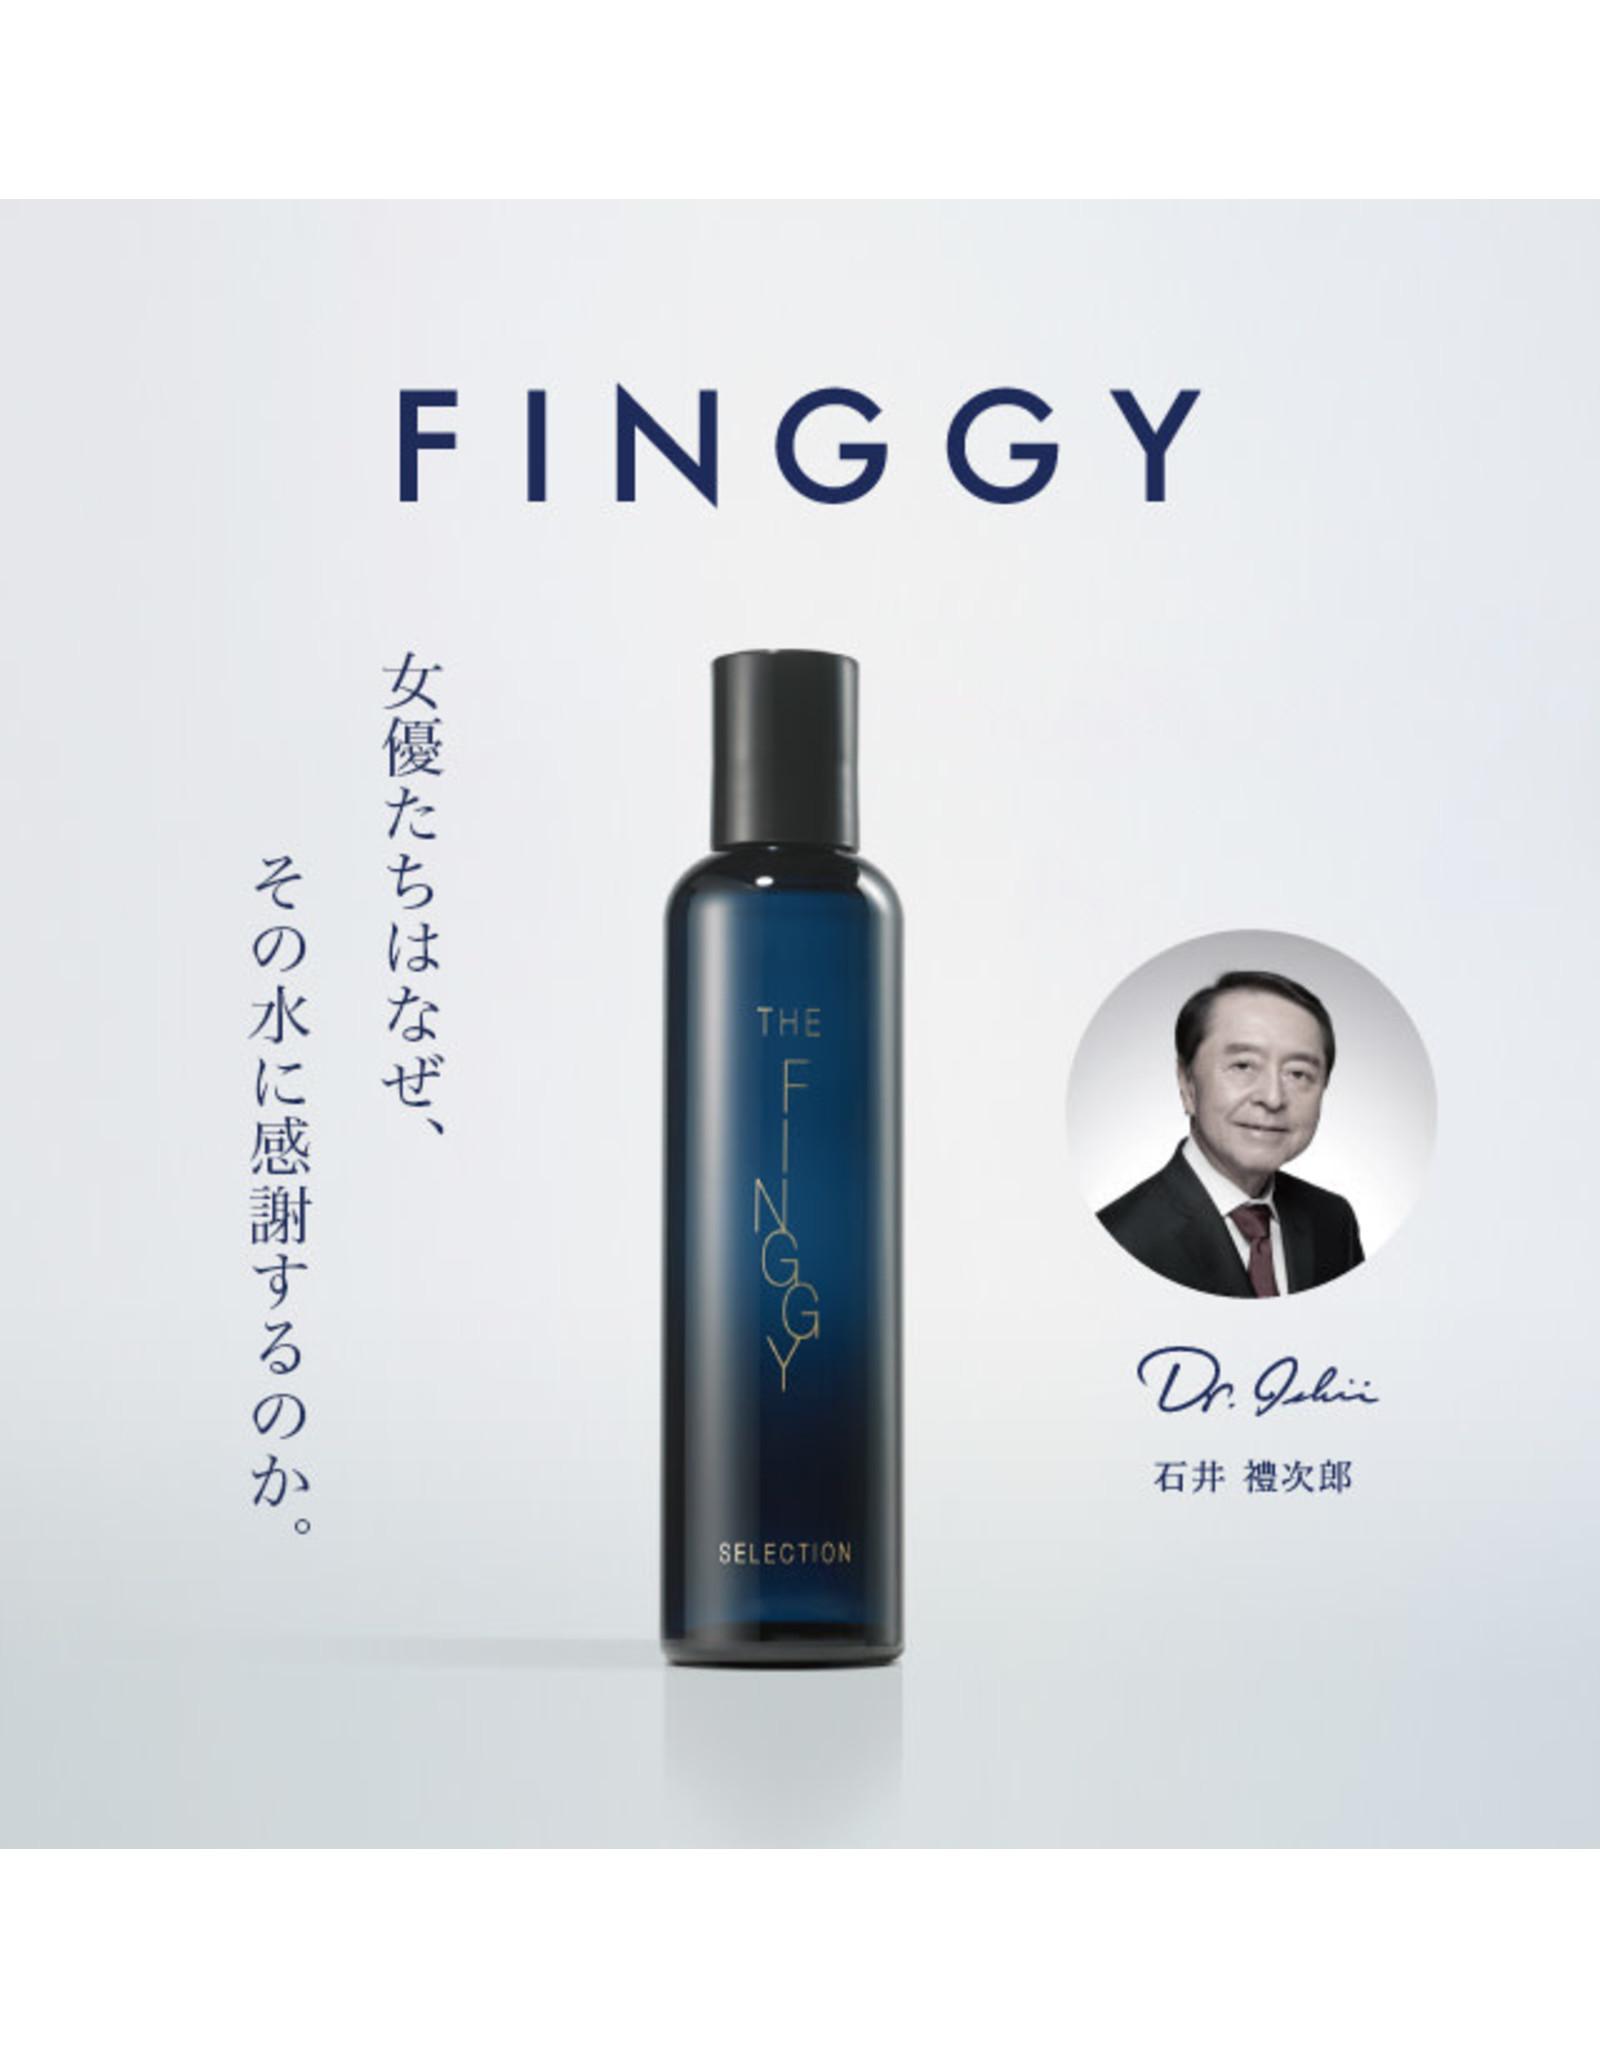 Shiseido The Finggy Skin Lotion 200ml